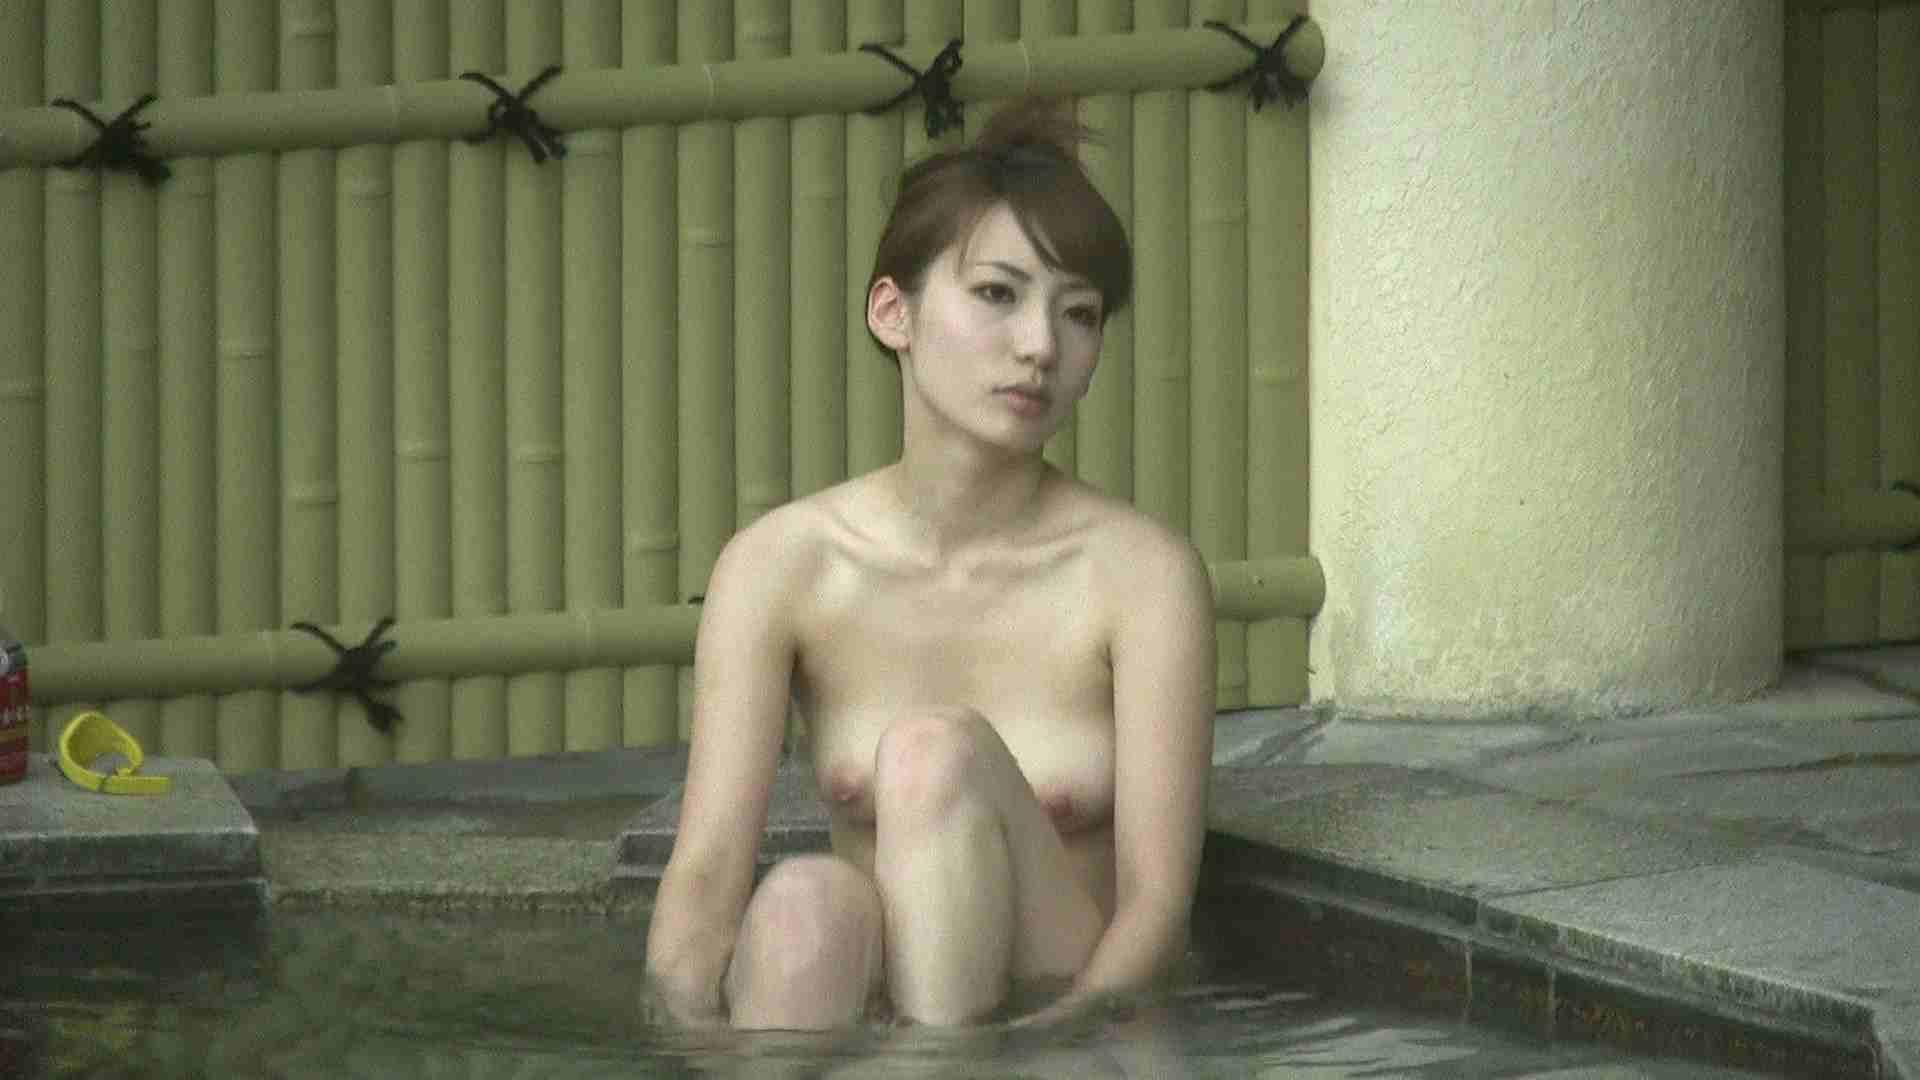 Aquaな露天風呂Vol.208 露天風呂編  103PIX 50